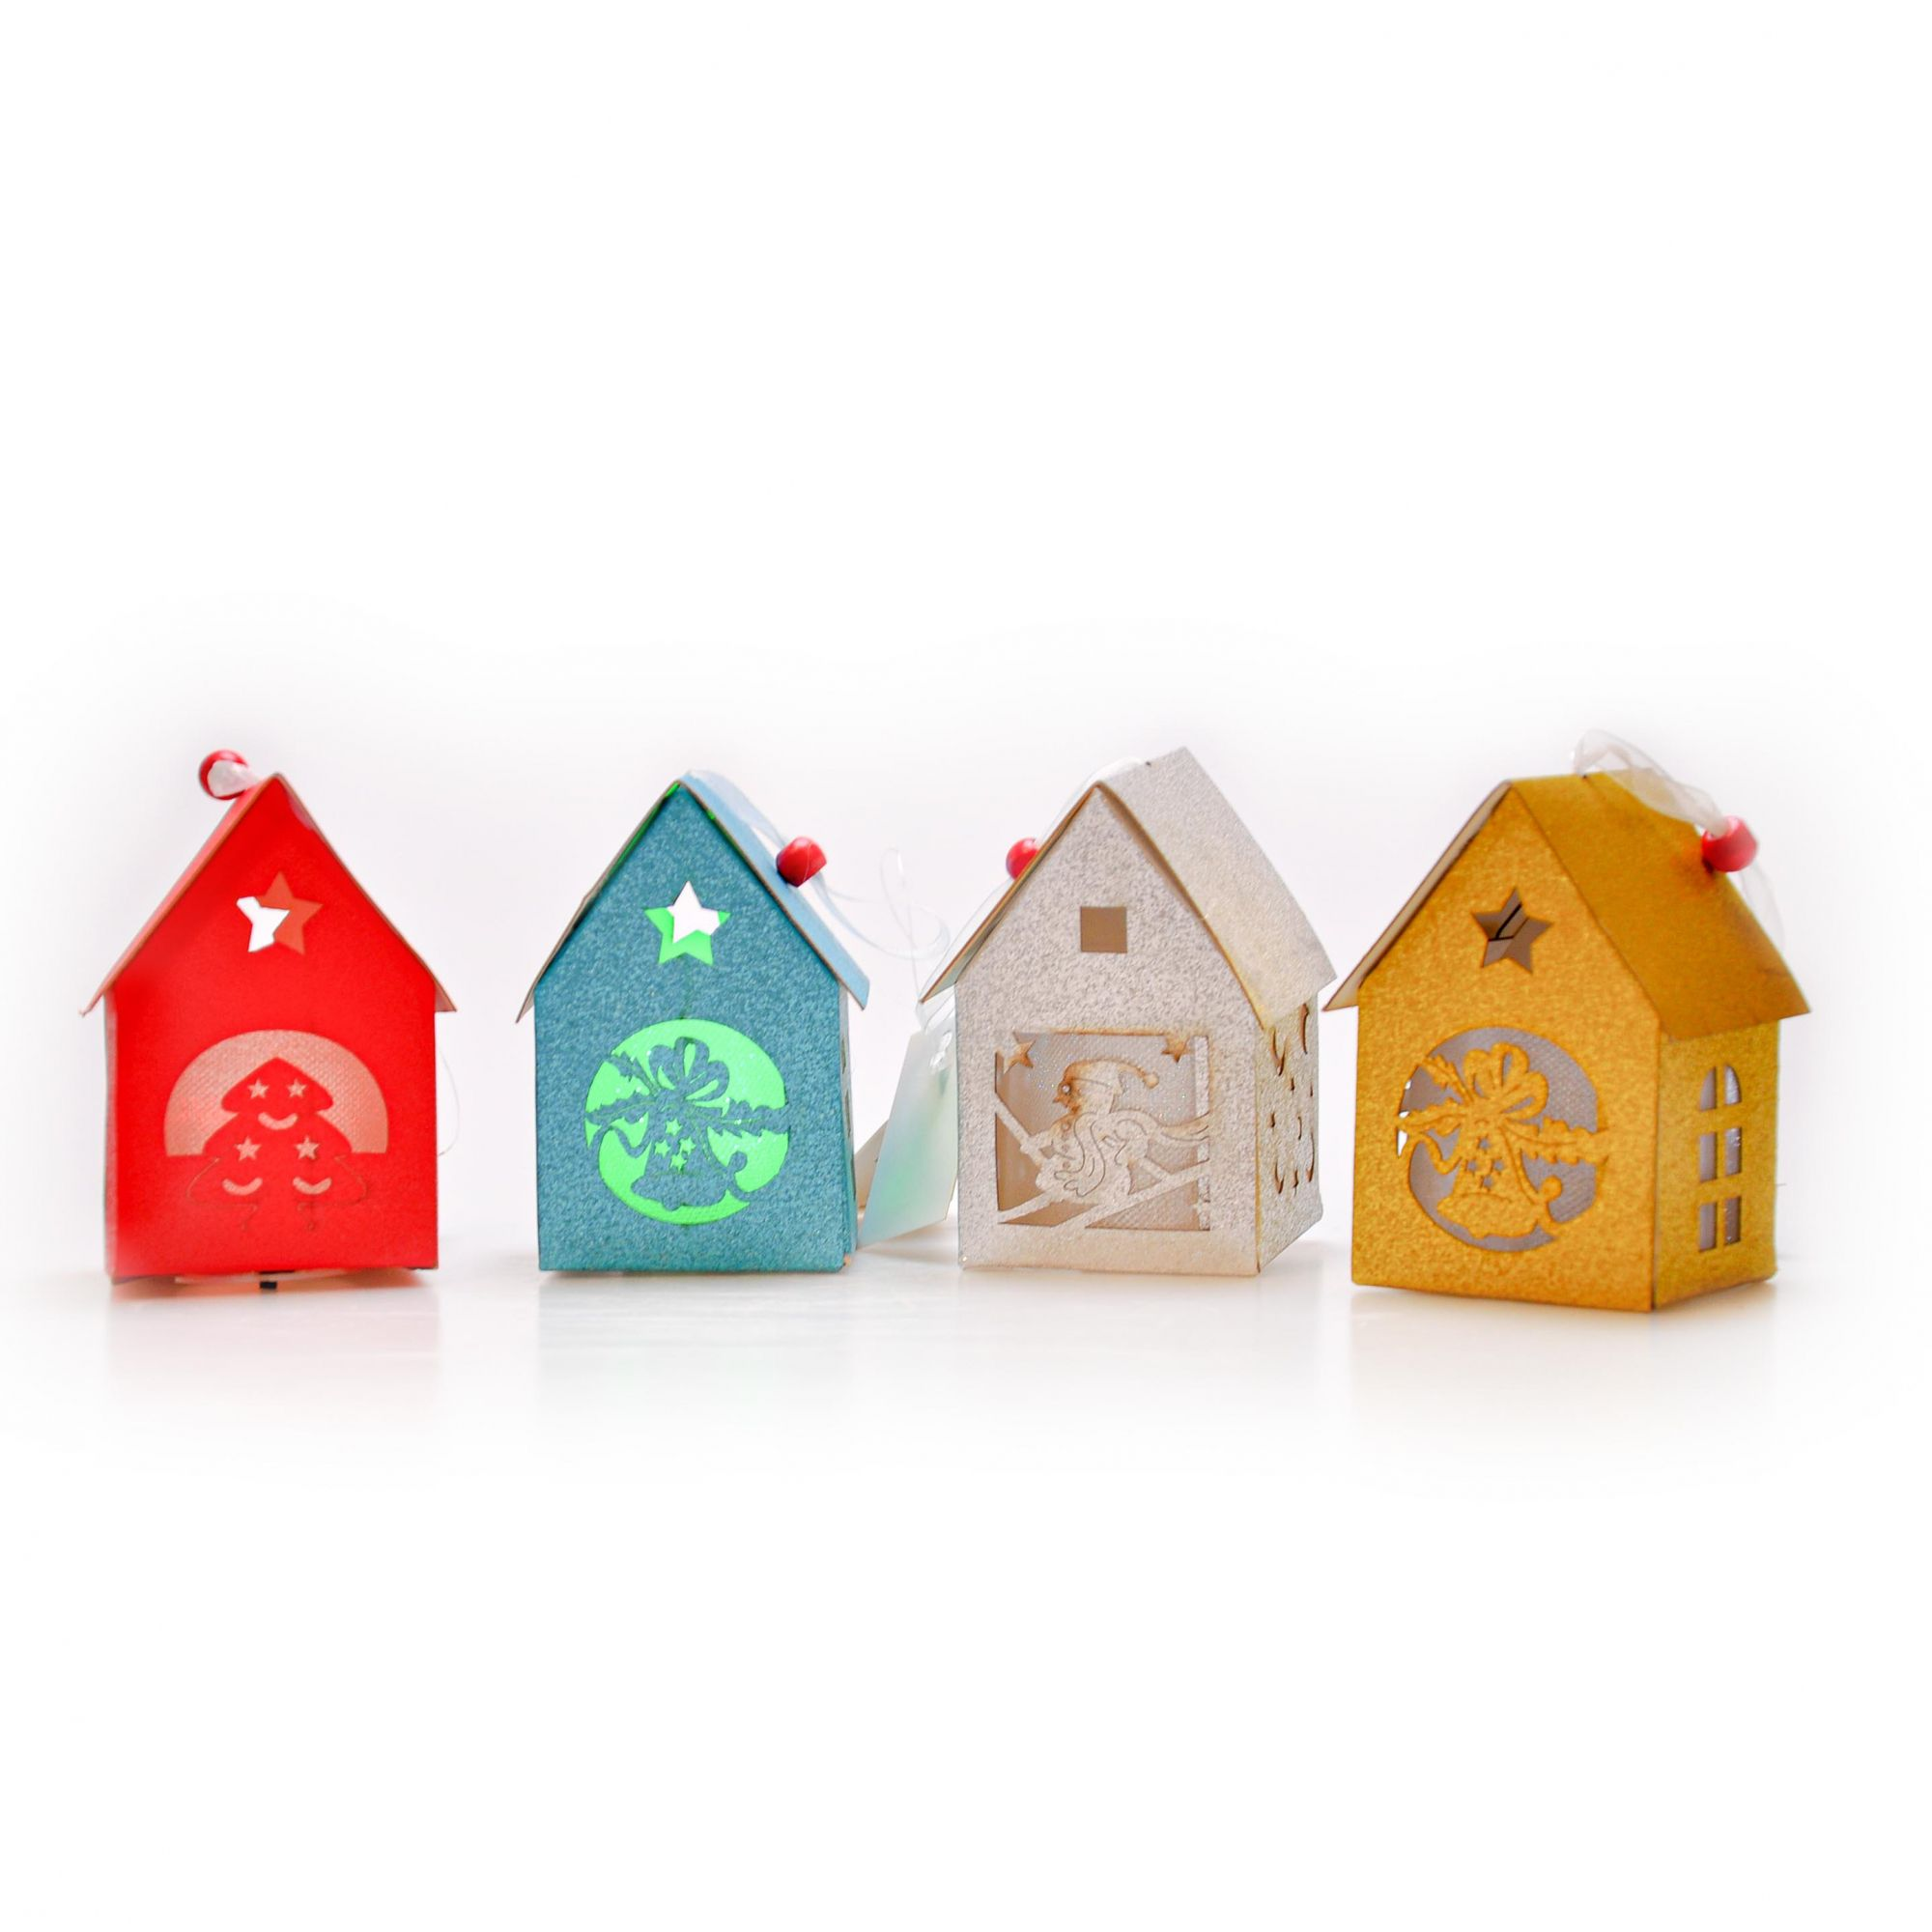 Enfeite Natalino Casa colorida 10x6,5x06cm (Dispon. em 04 cores- acende luz)